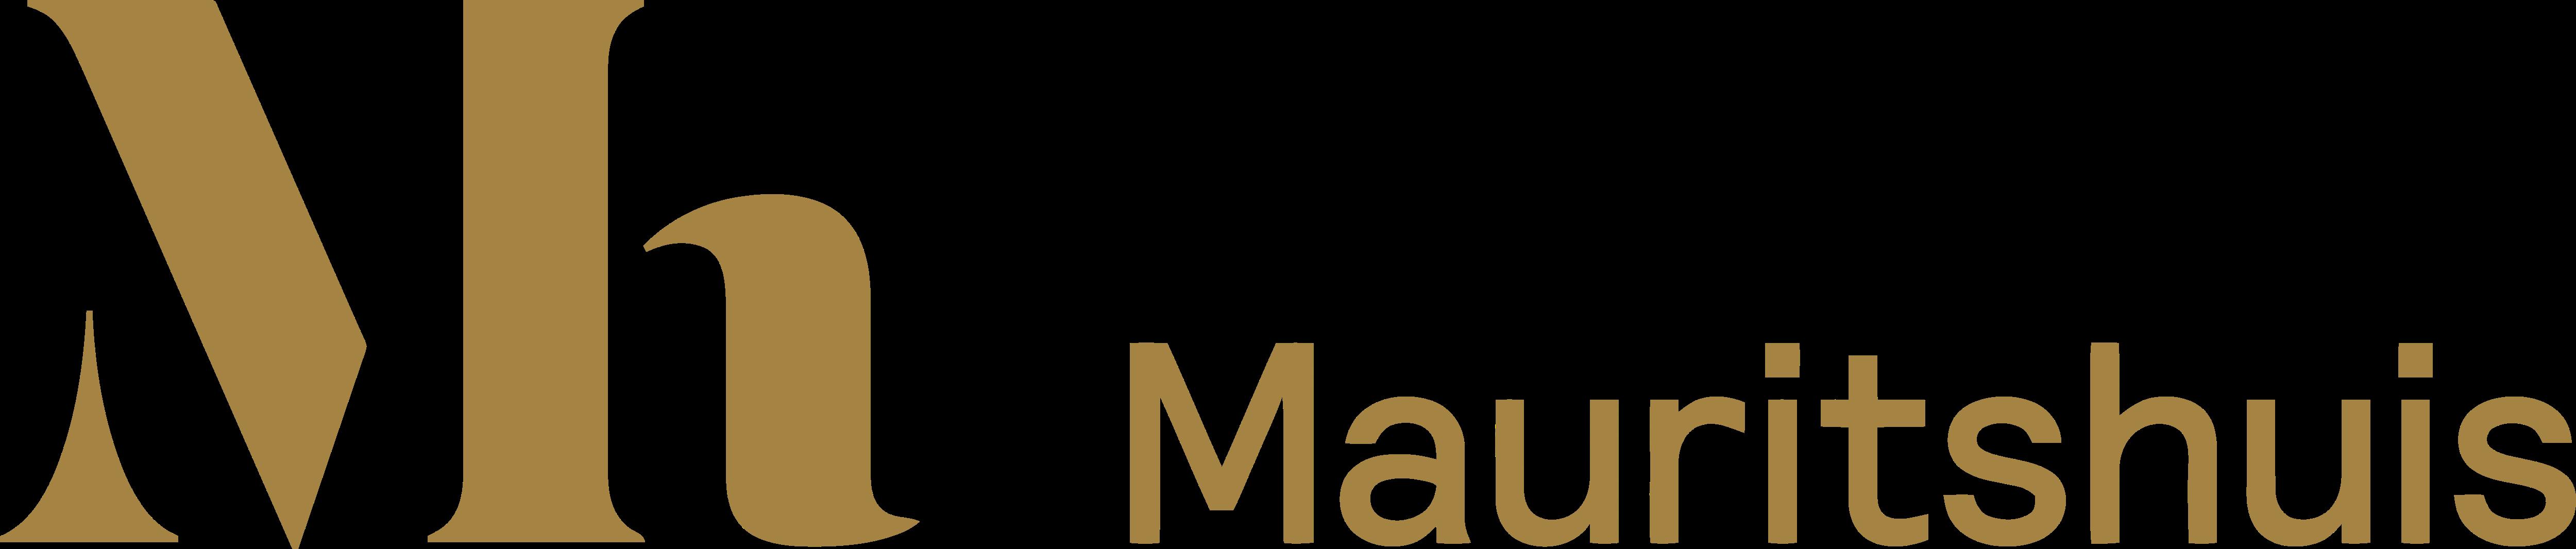 Mauritshuis – Logos Download